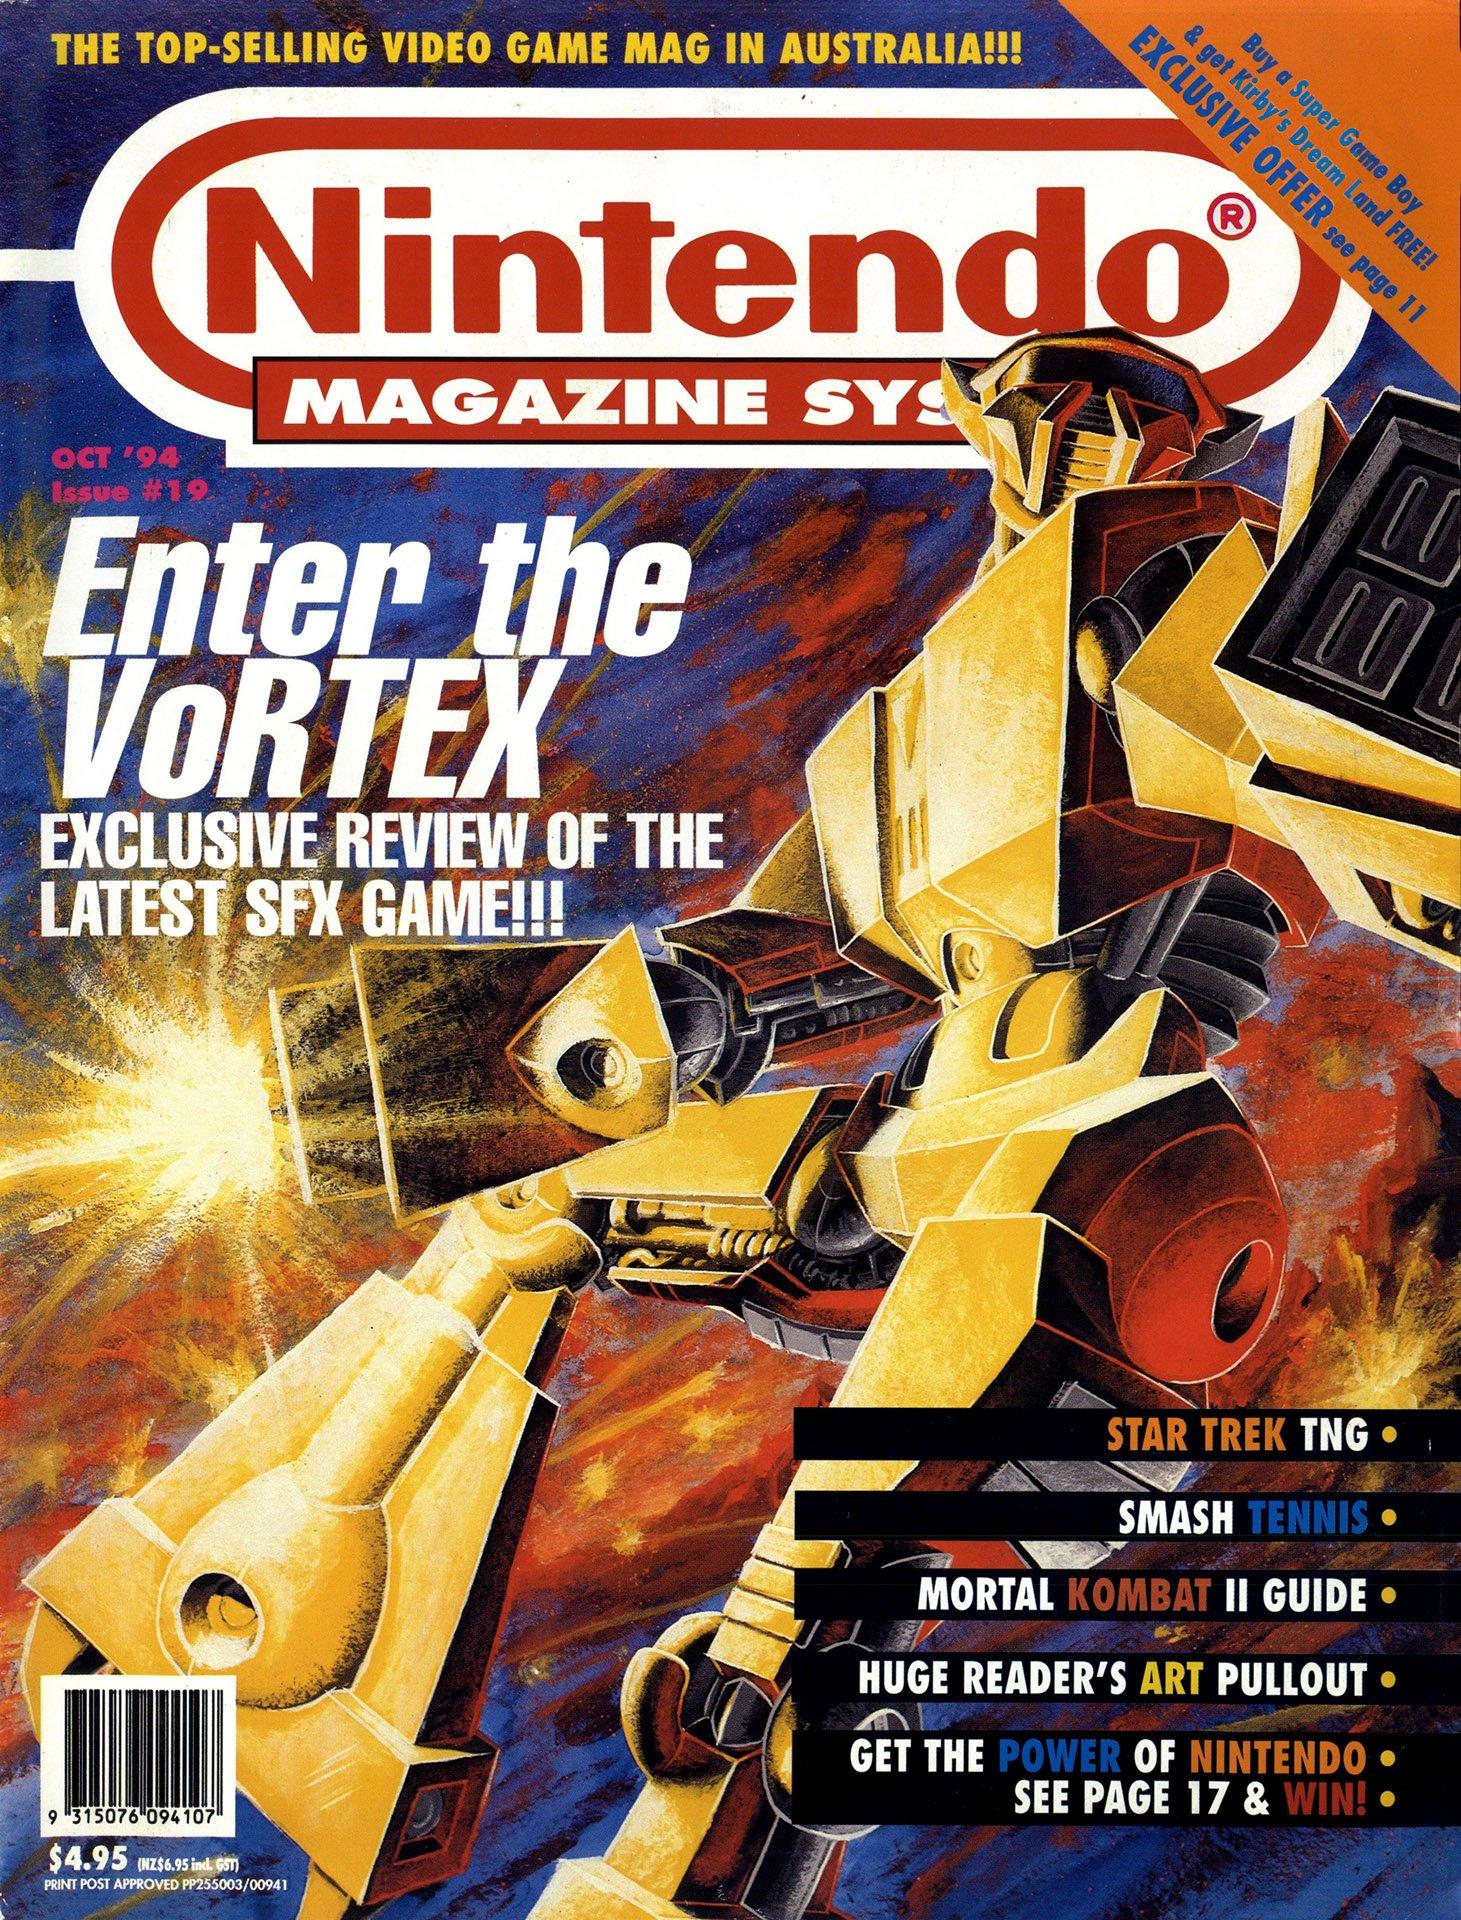 Nintendo Magazine System (AUS) 019 (October 1994)